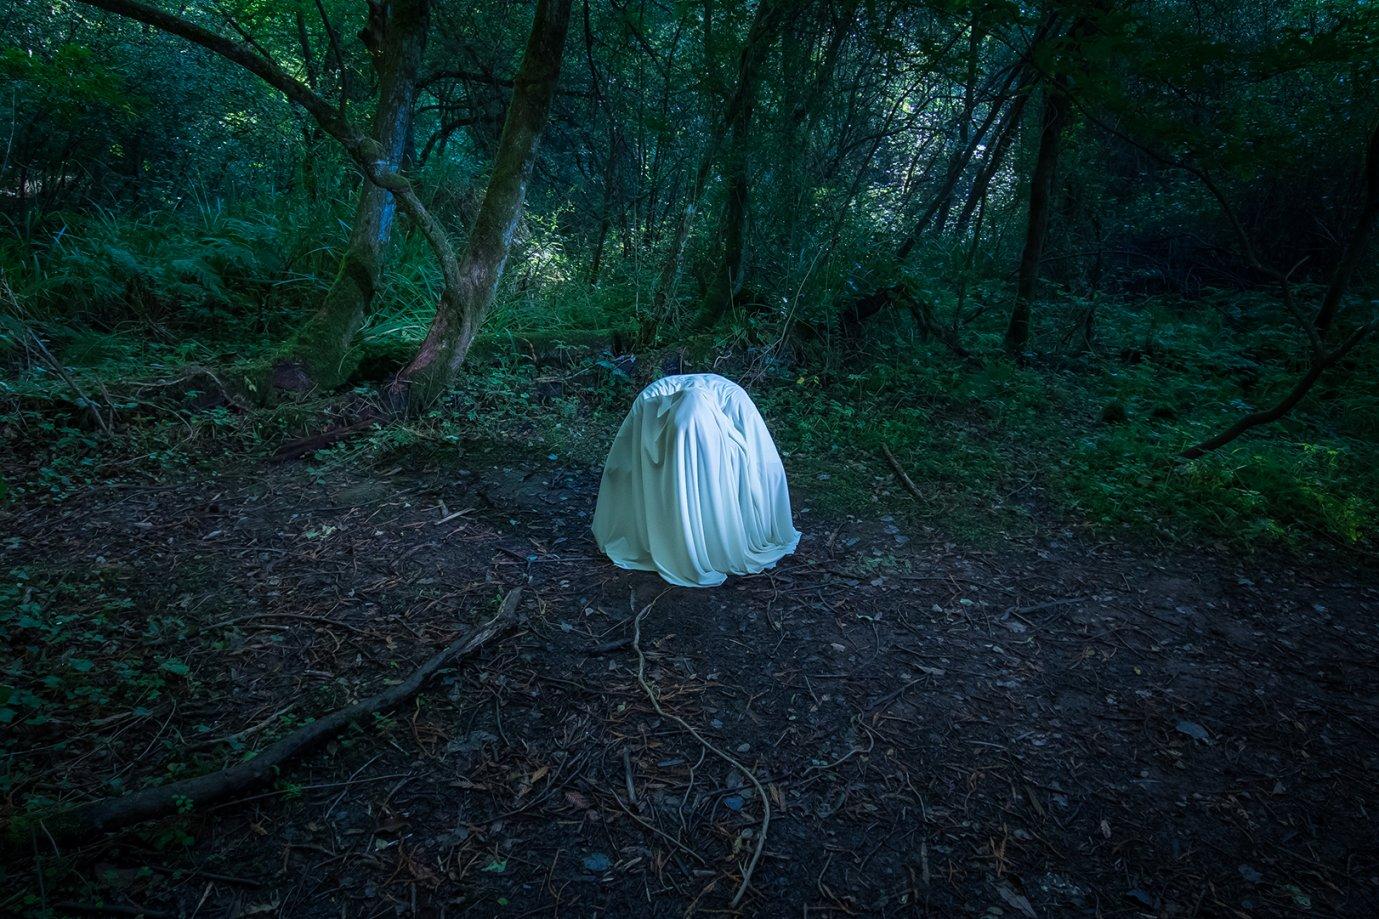 Into the Wood (2017) - Carlotta Gambato